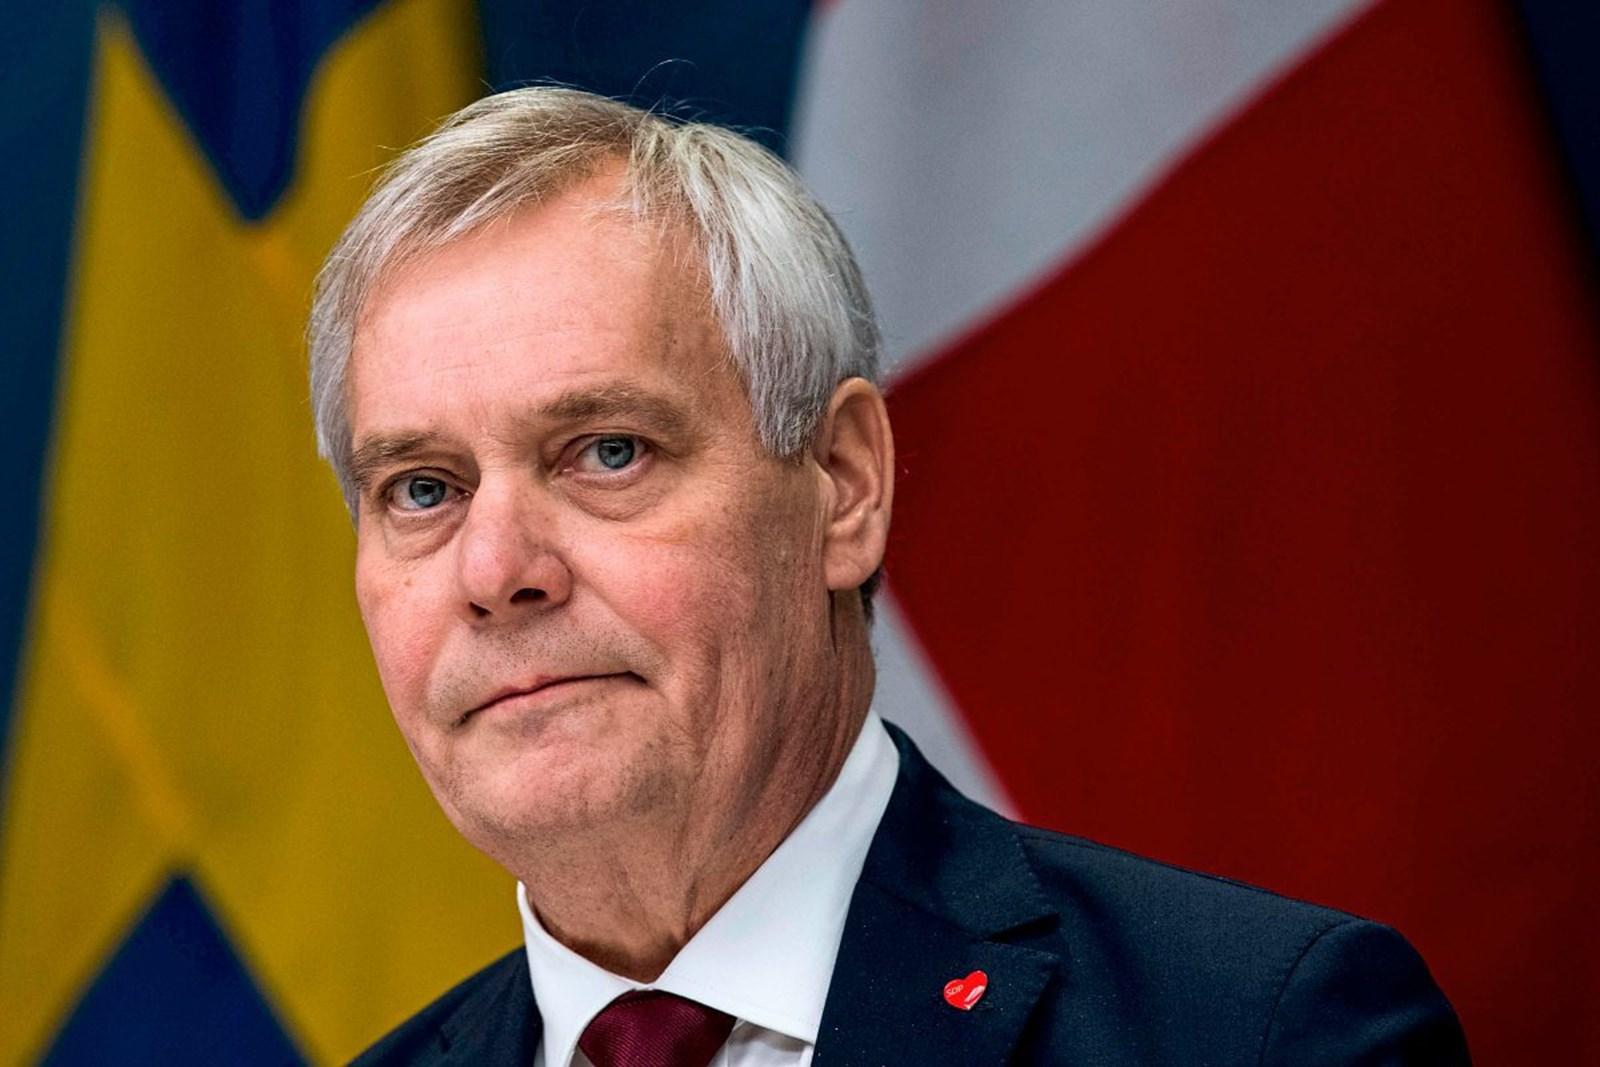 Finnischer Ministerpräsident Rinne ist zurückgetreten